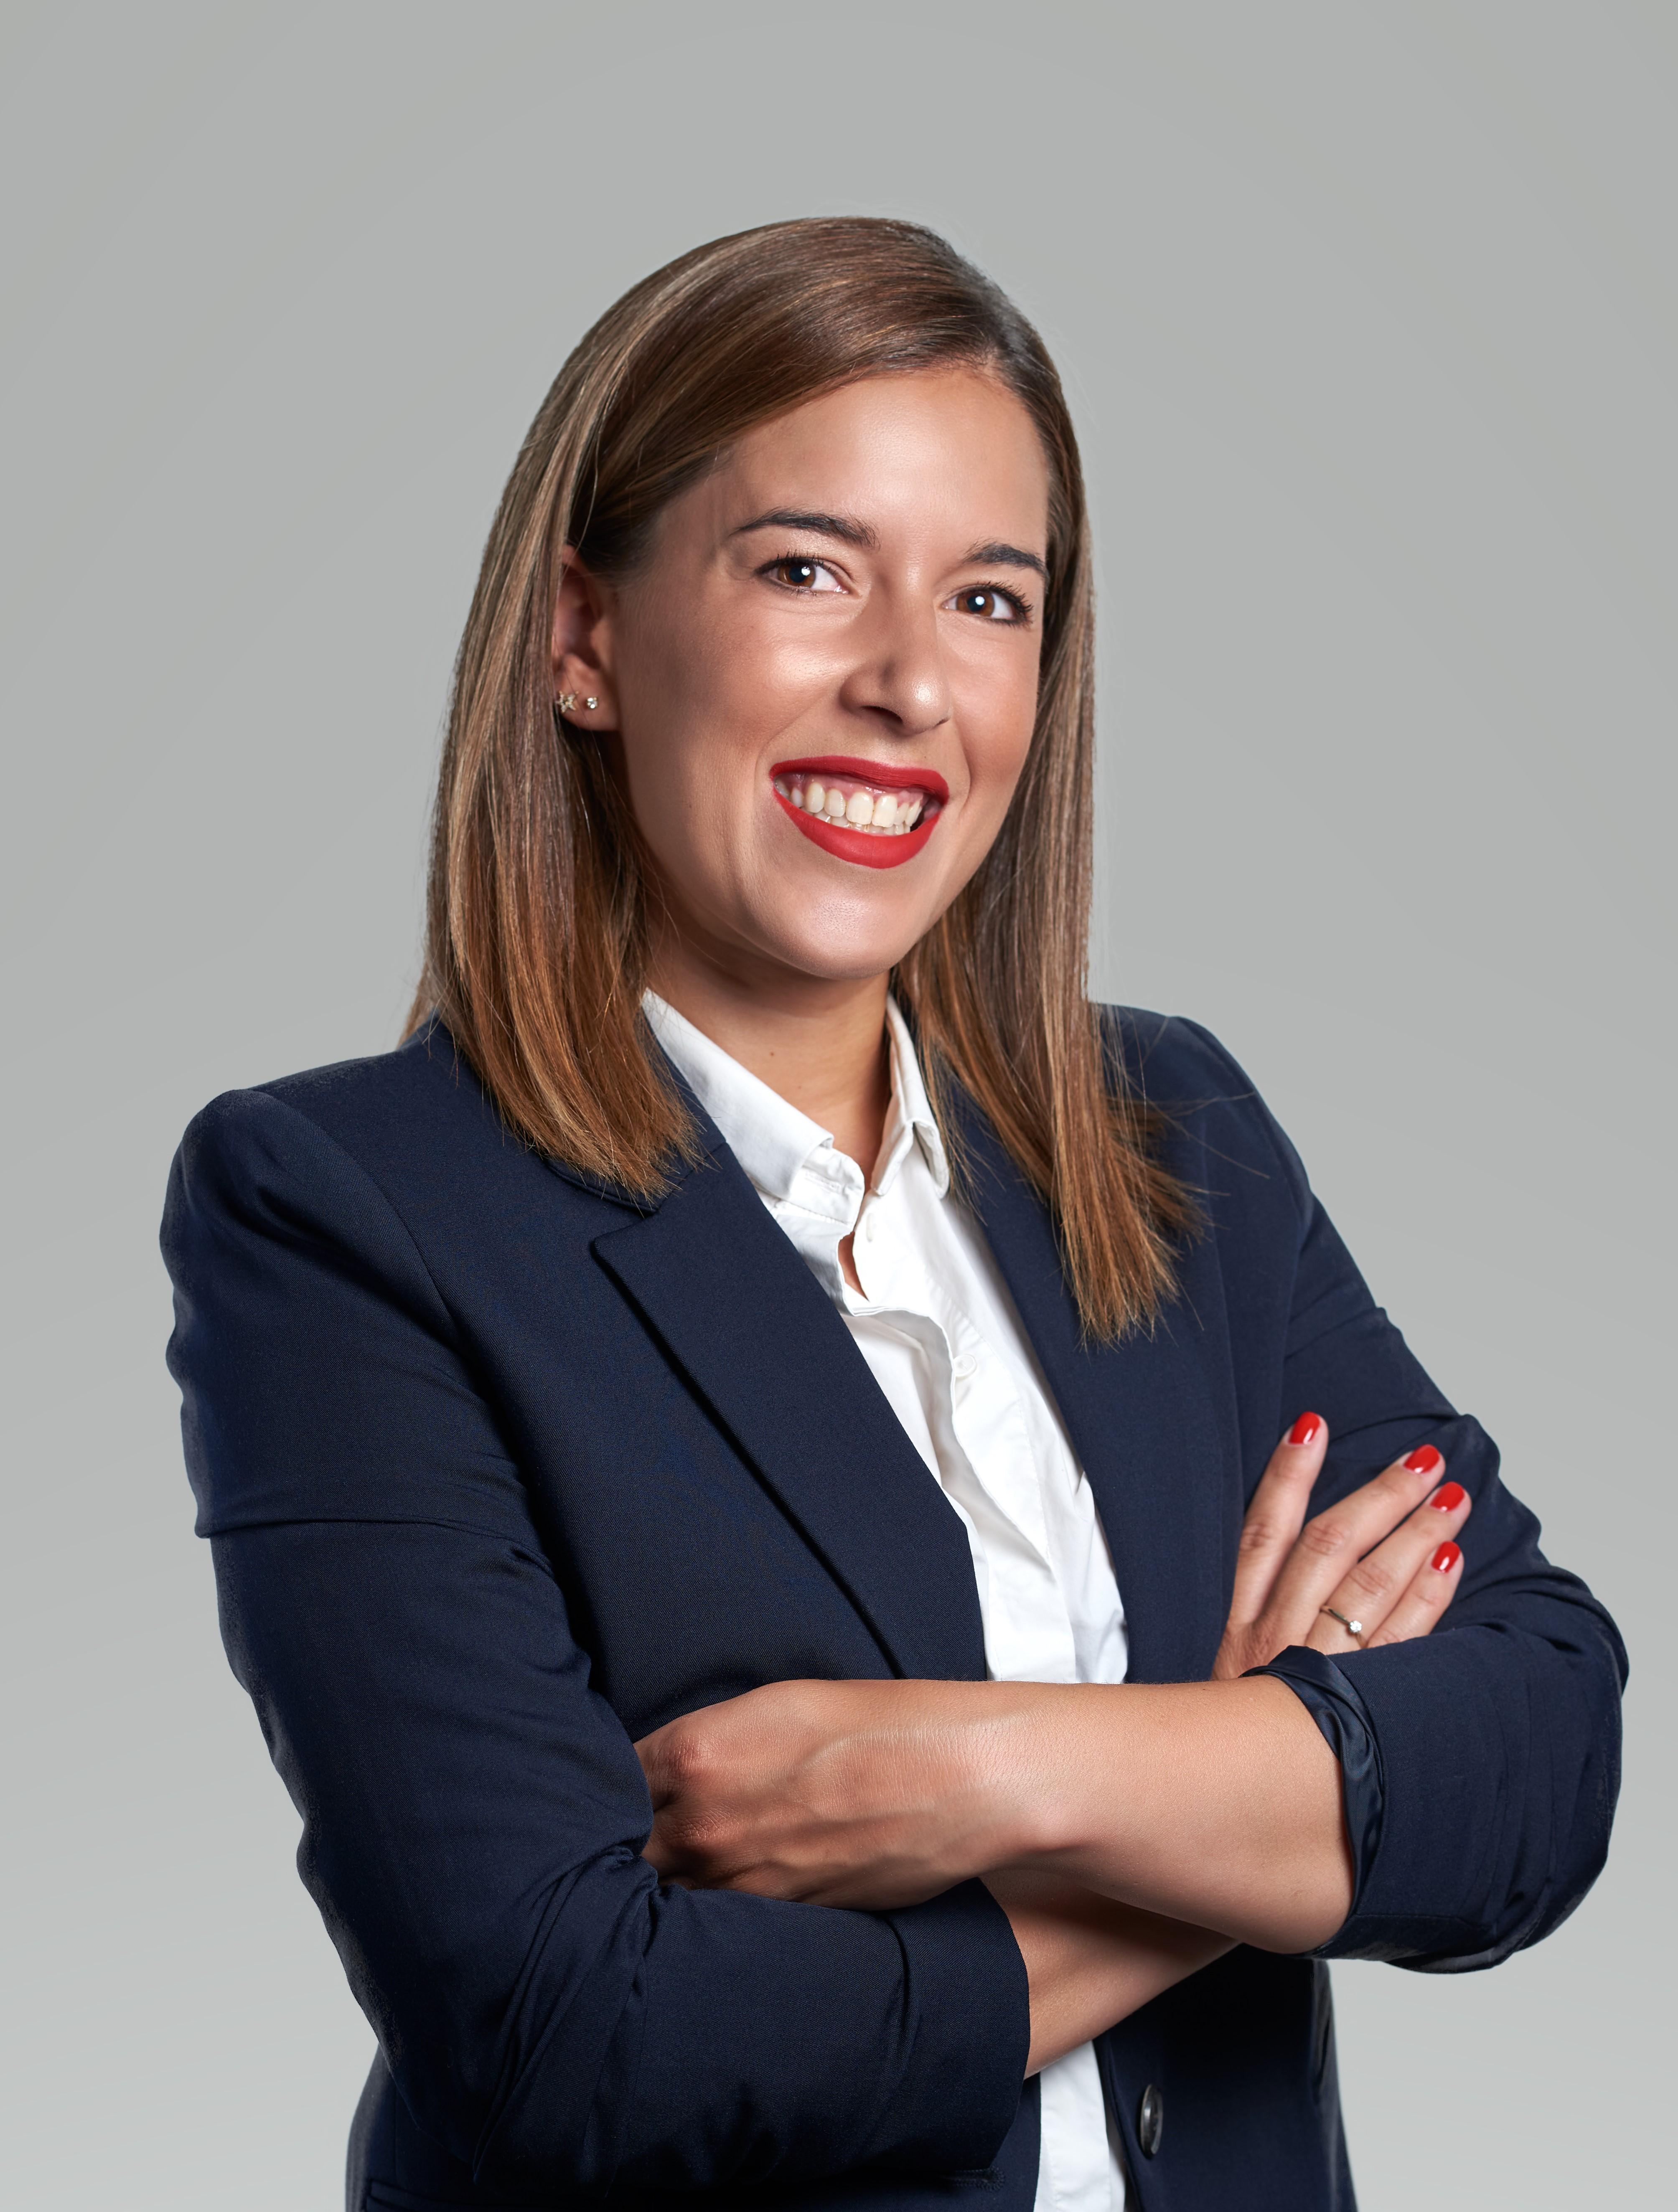 Desirée Albaladejo Núñez